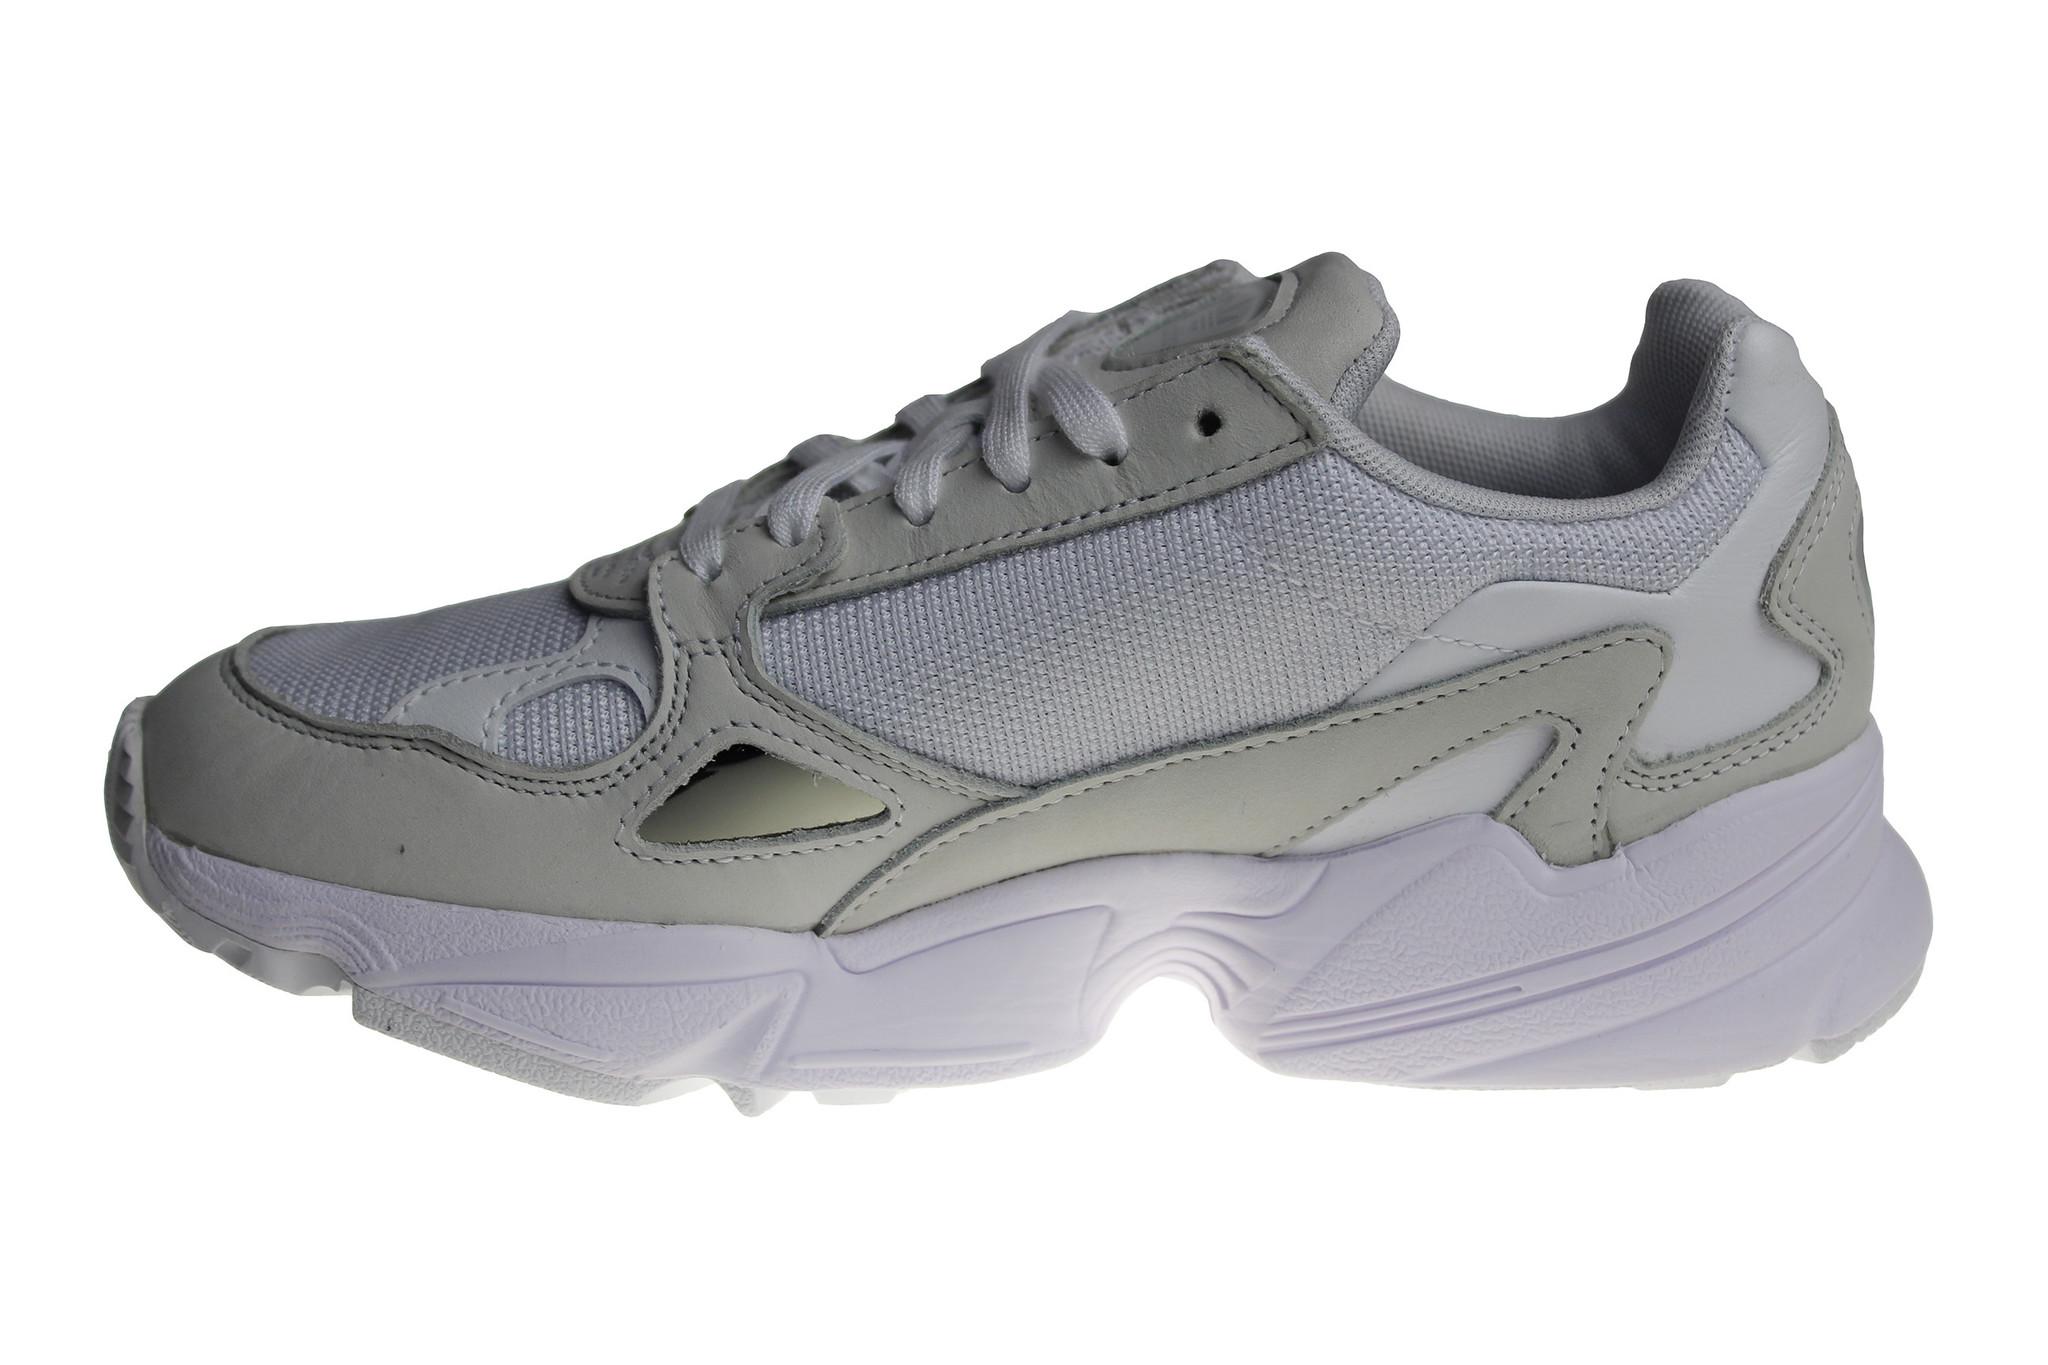 Bestes Angebot für Adidas Schuhe Falcon W B28128 Ftwwht